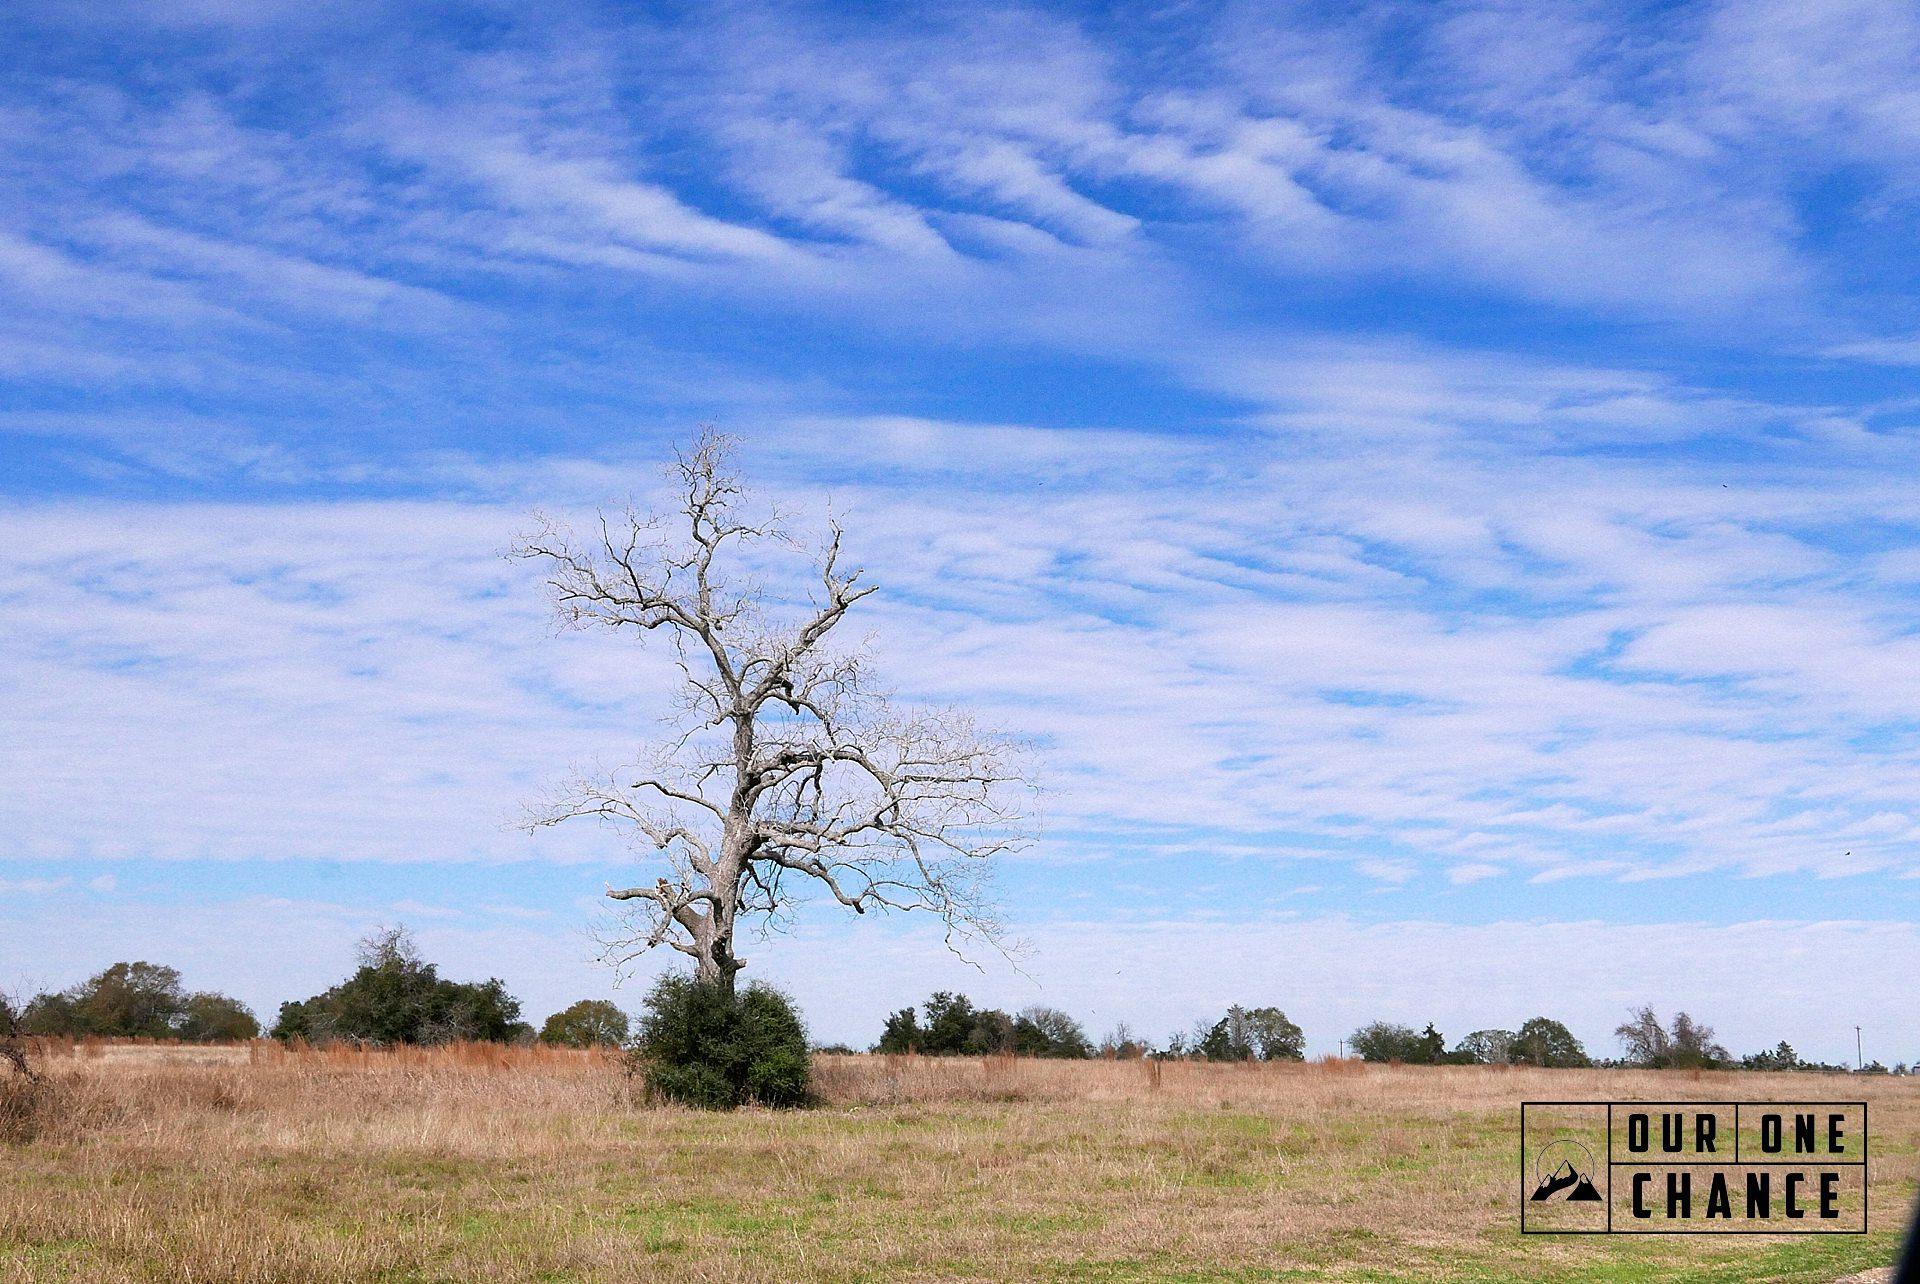 RV Across the Country Texas_0028